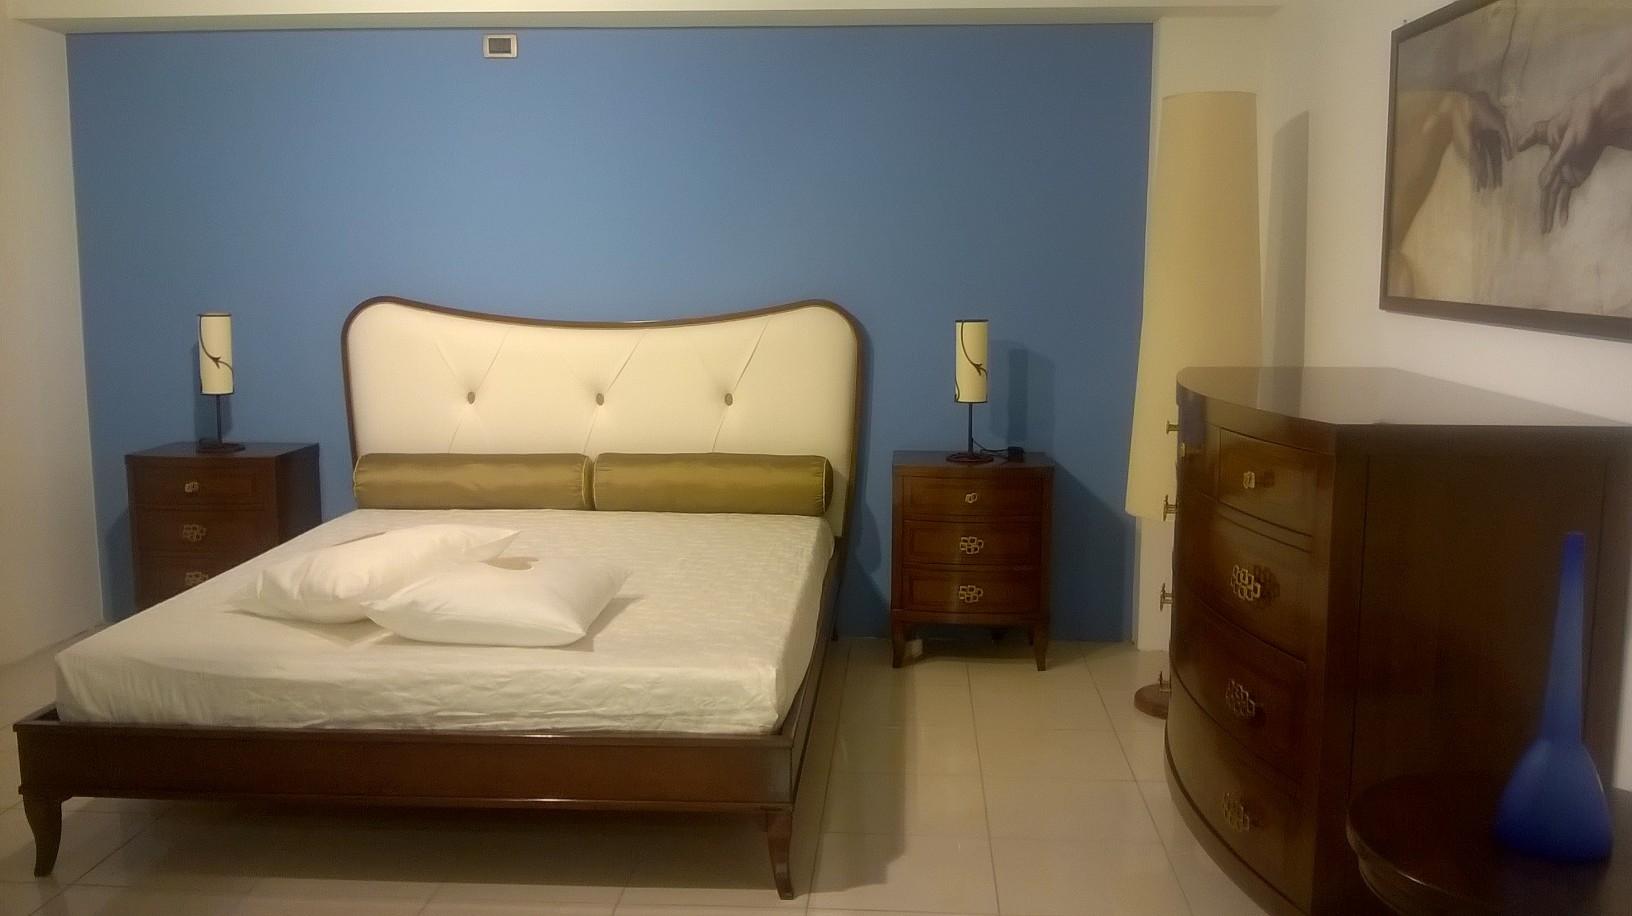 Tessuto tende camera bambini - Le fablier camere da letto le mimose ...